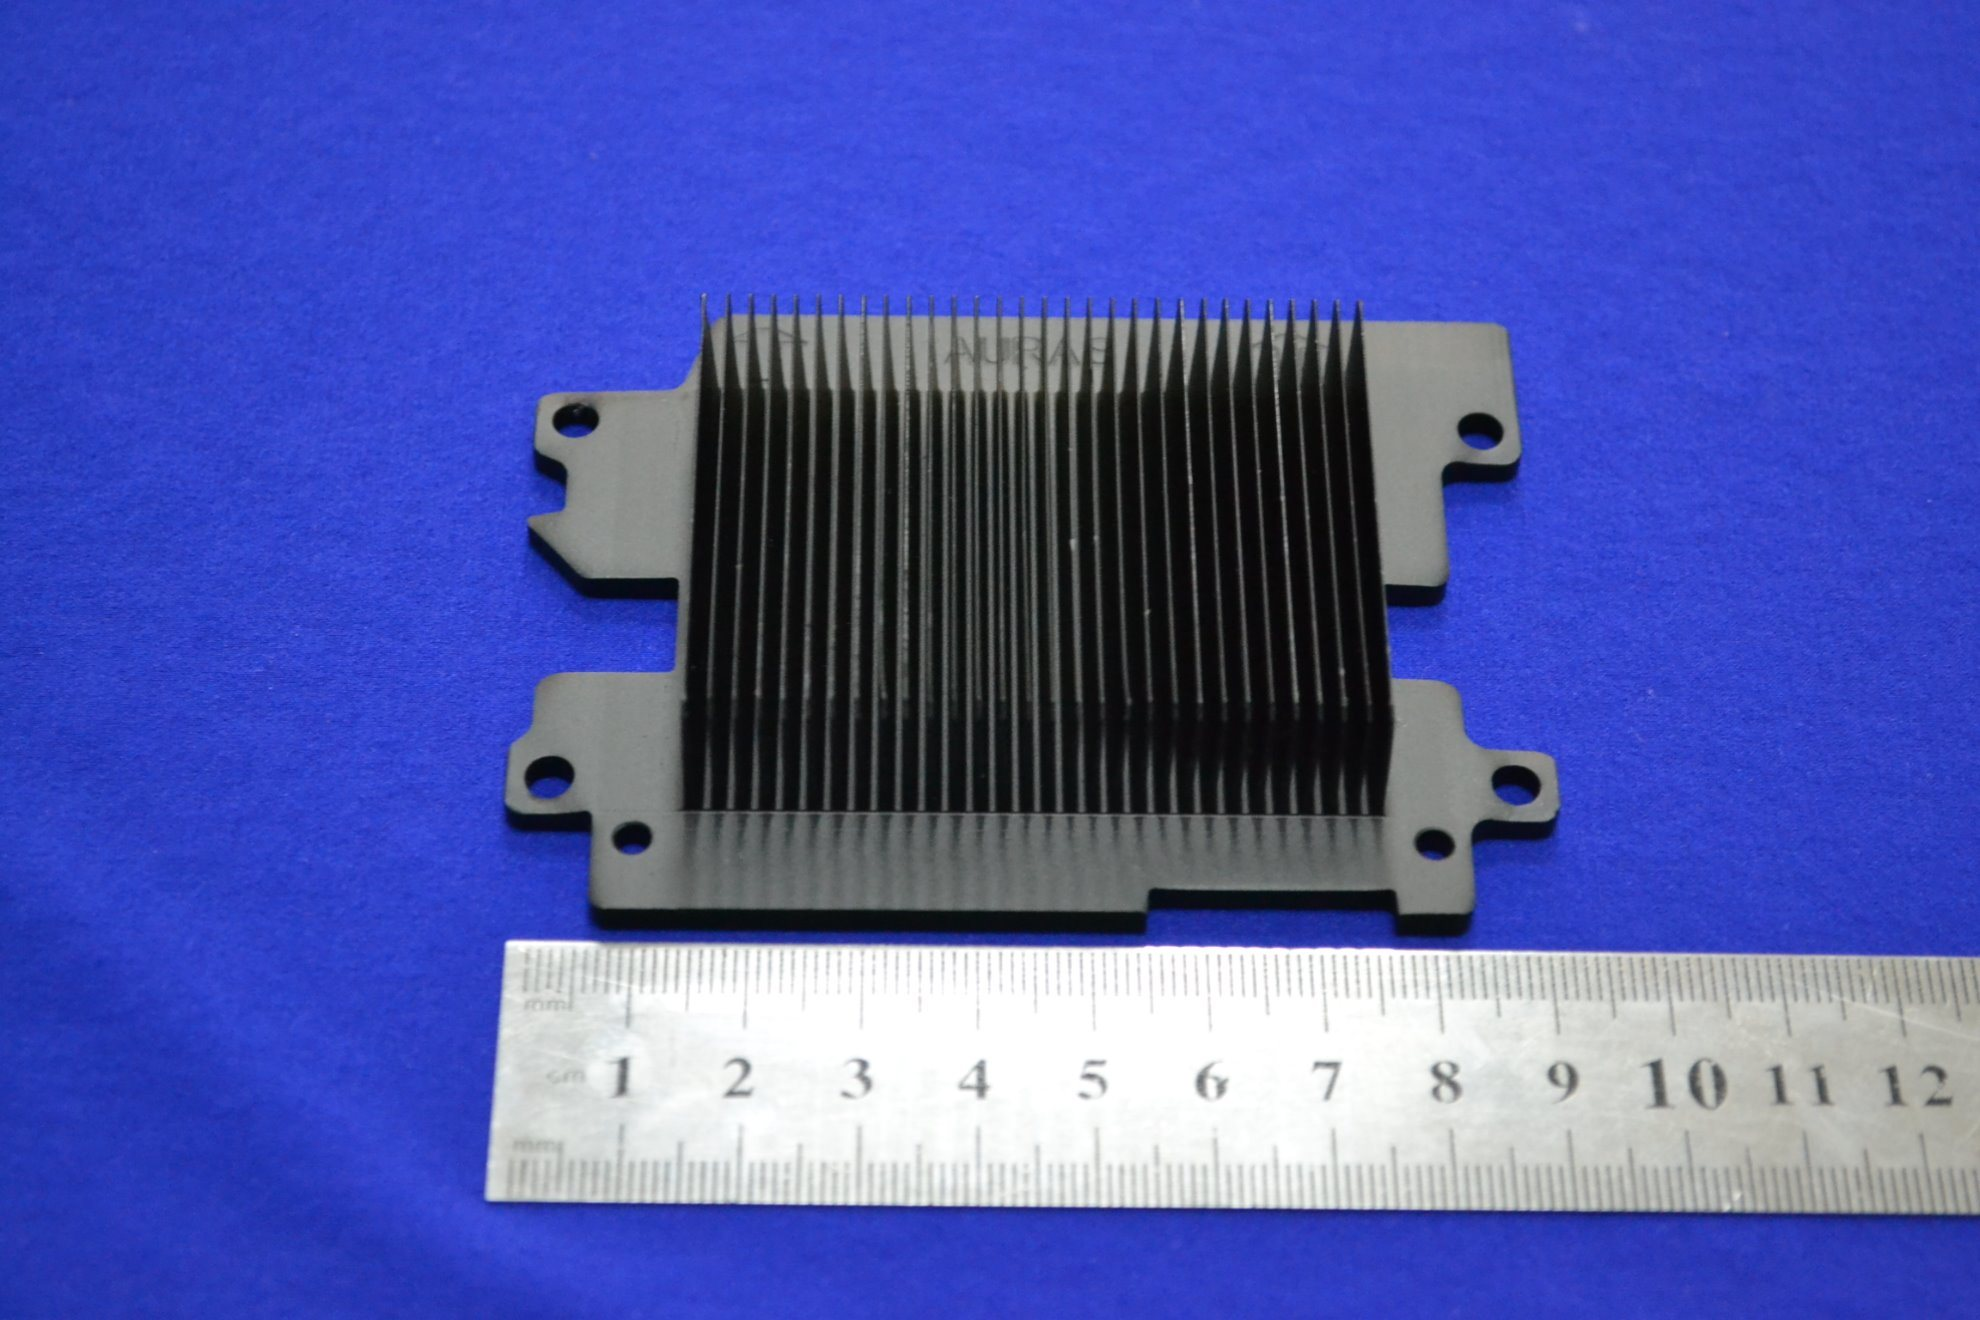 Pack of 100 SMD 1//2watt .22ohms 1/% Non Standard WSL2010R2200FEA Current Sense Resistors